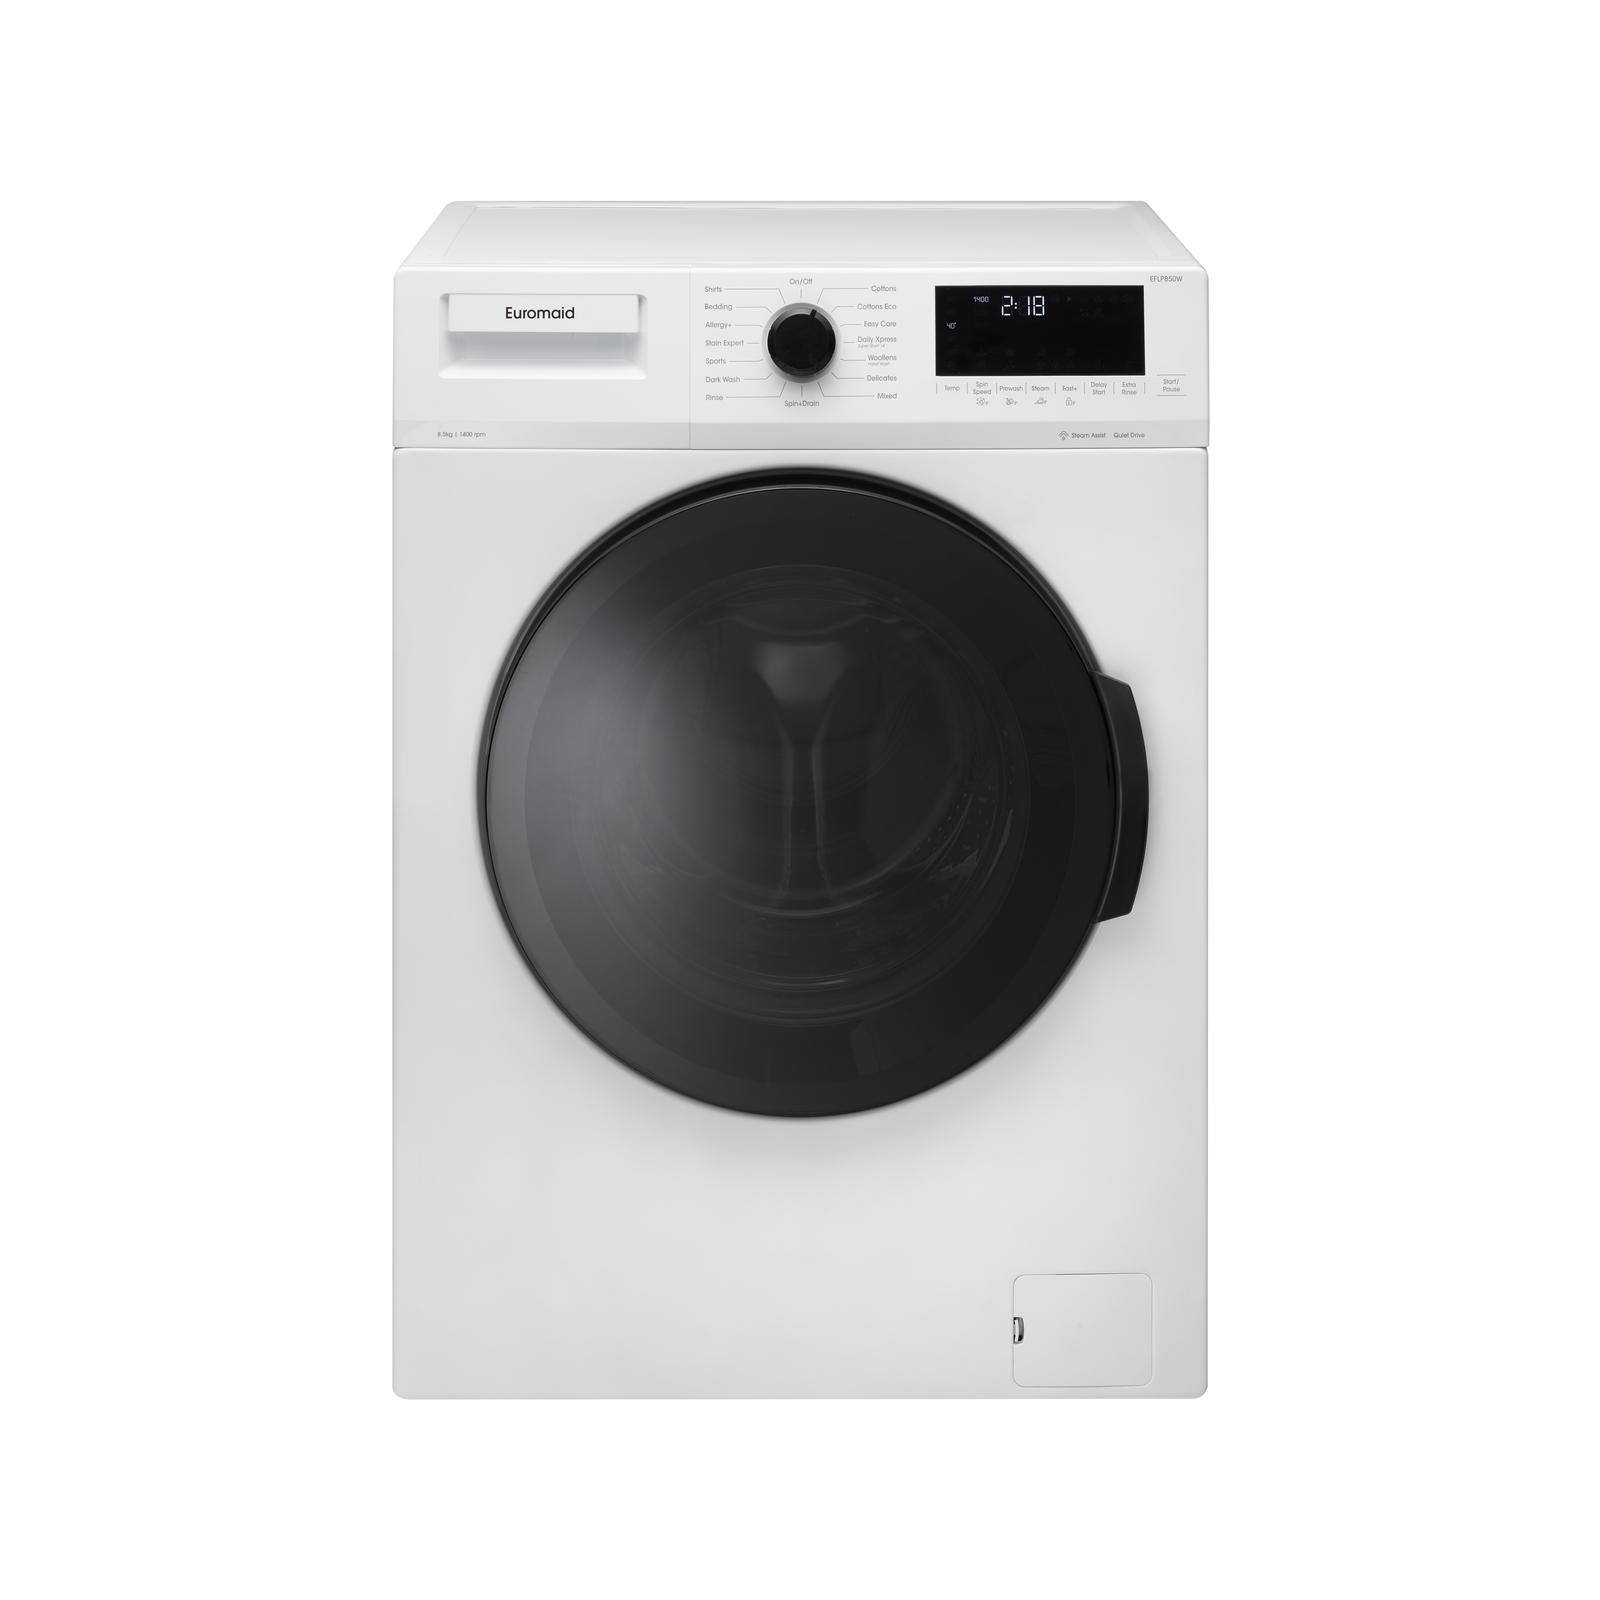 Euromaid EFL1000W 10kg Front Load Washing Machine